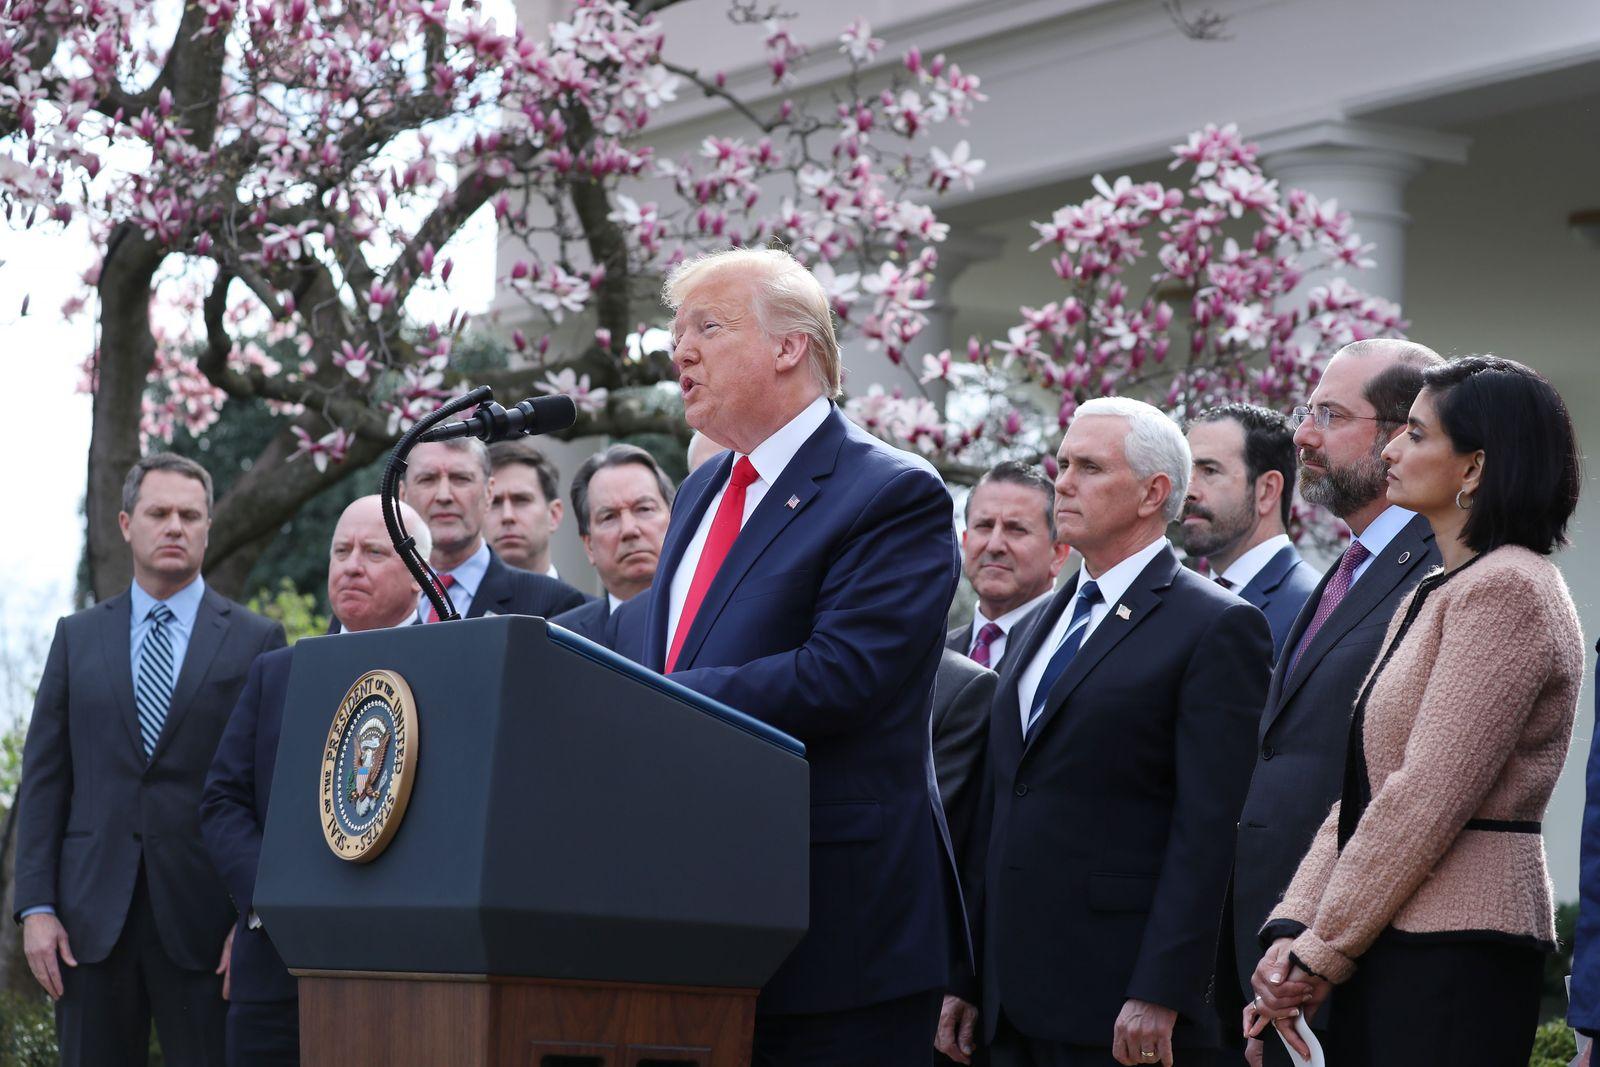 US President Donald J. Trump declares a national emergency due to the COVID-19 coronavirus pandemic, Washington, USA - 13 Mar 2020